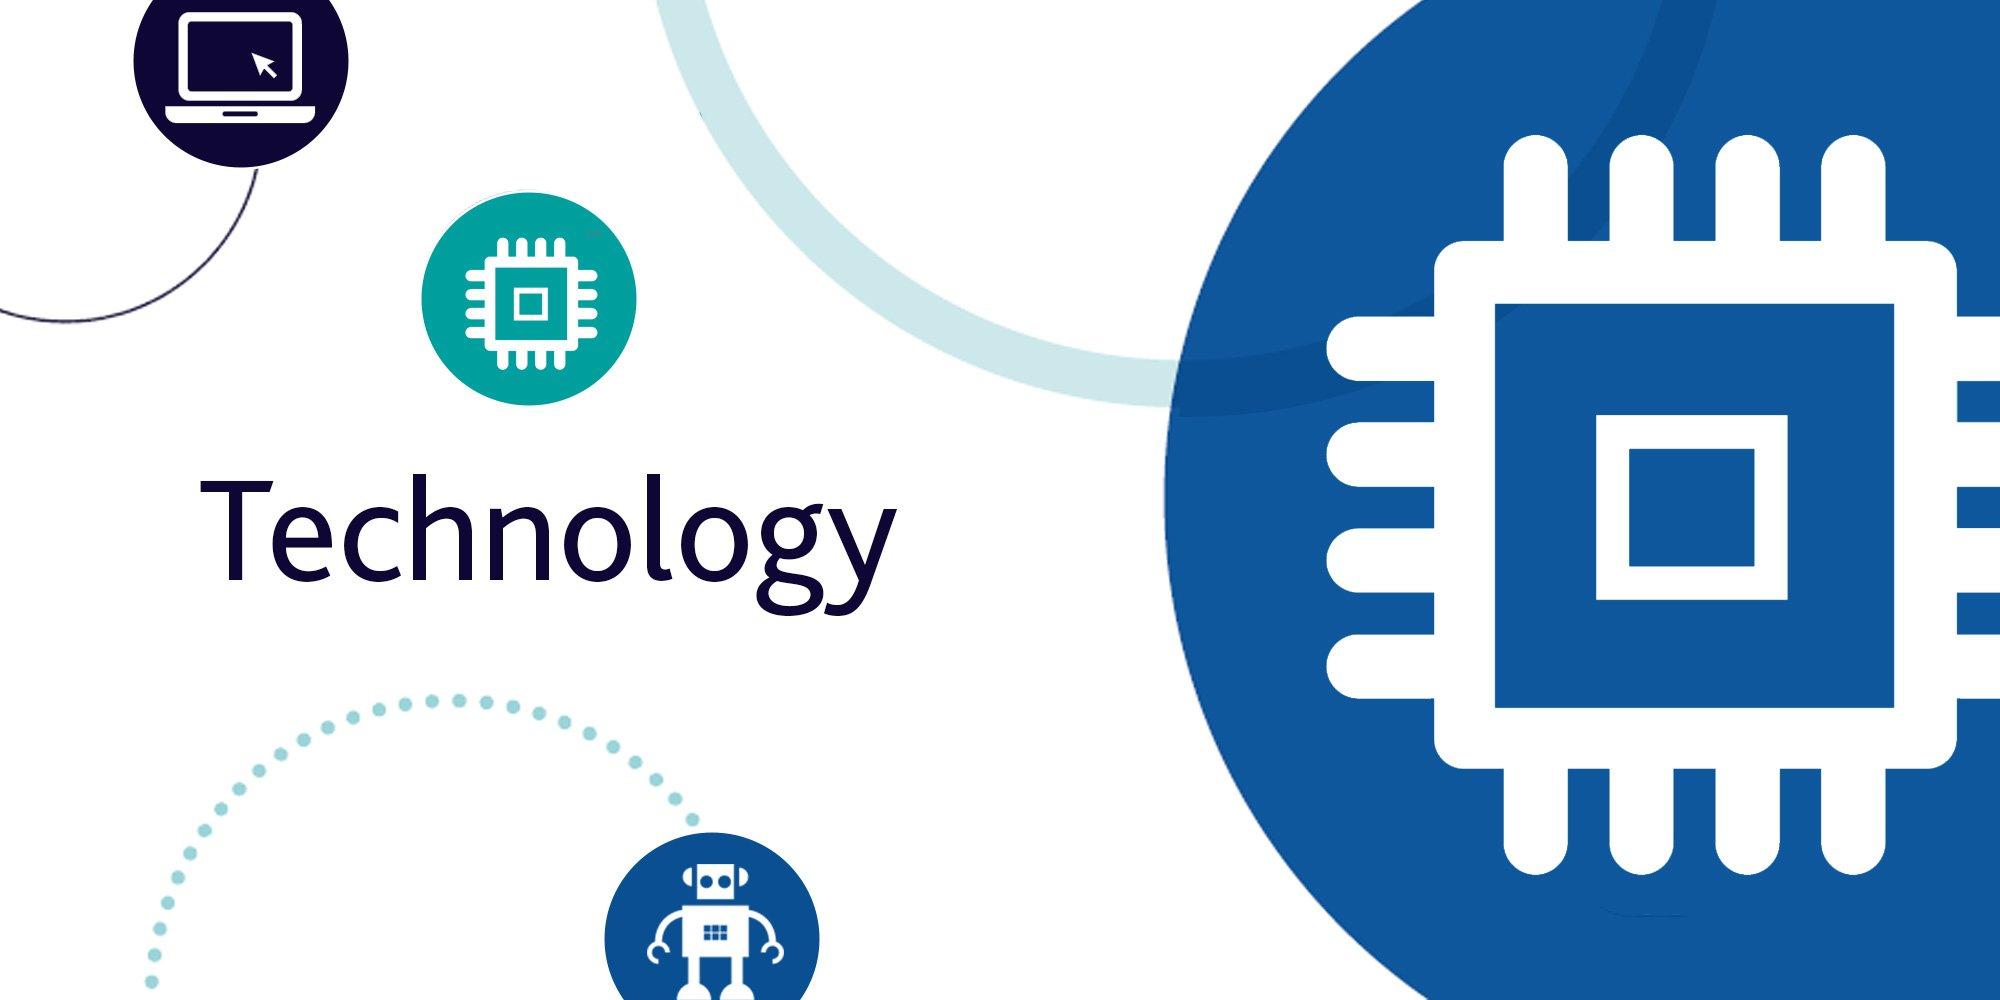 Technology Advancements A Boon Or Curse